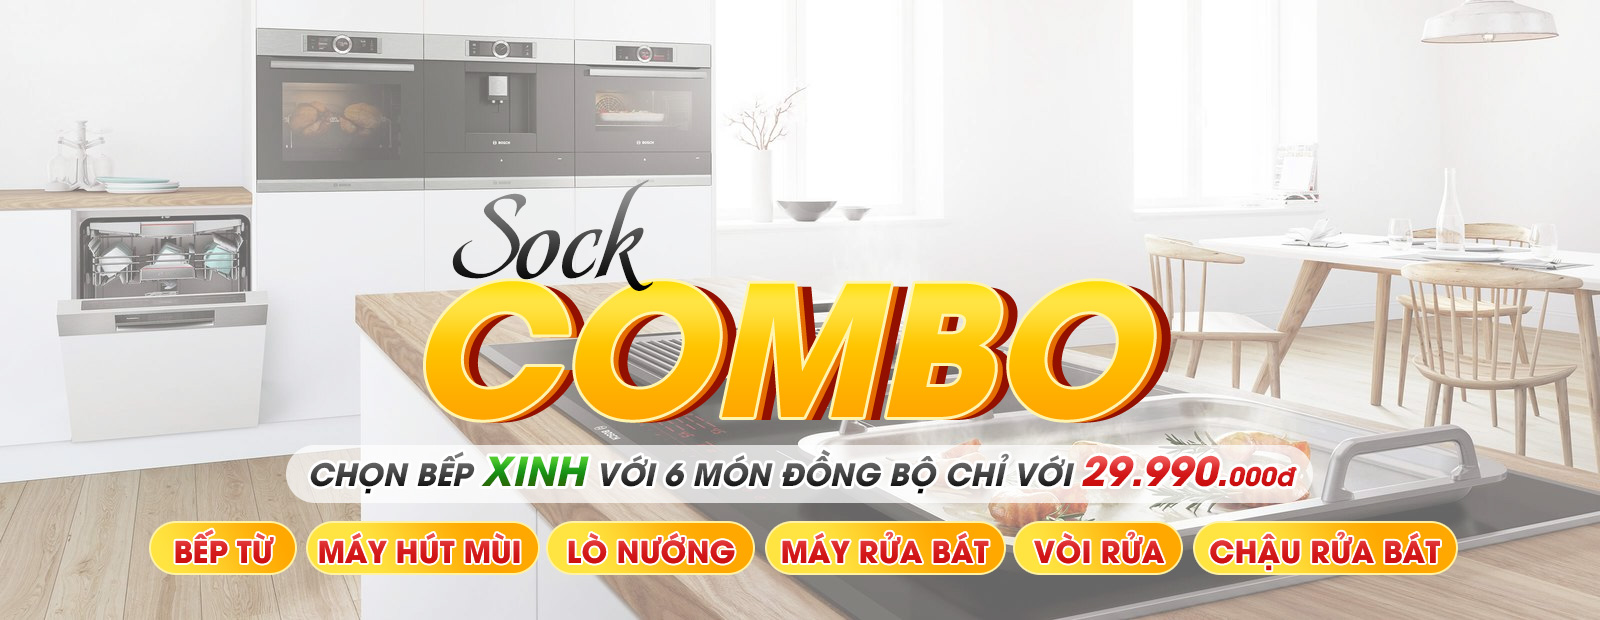 SOCK COMBO MUA 1 ĐƯỢC 6